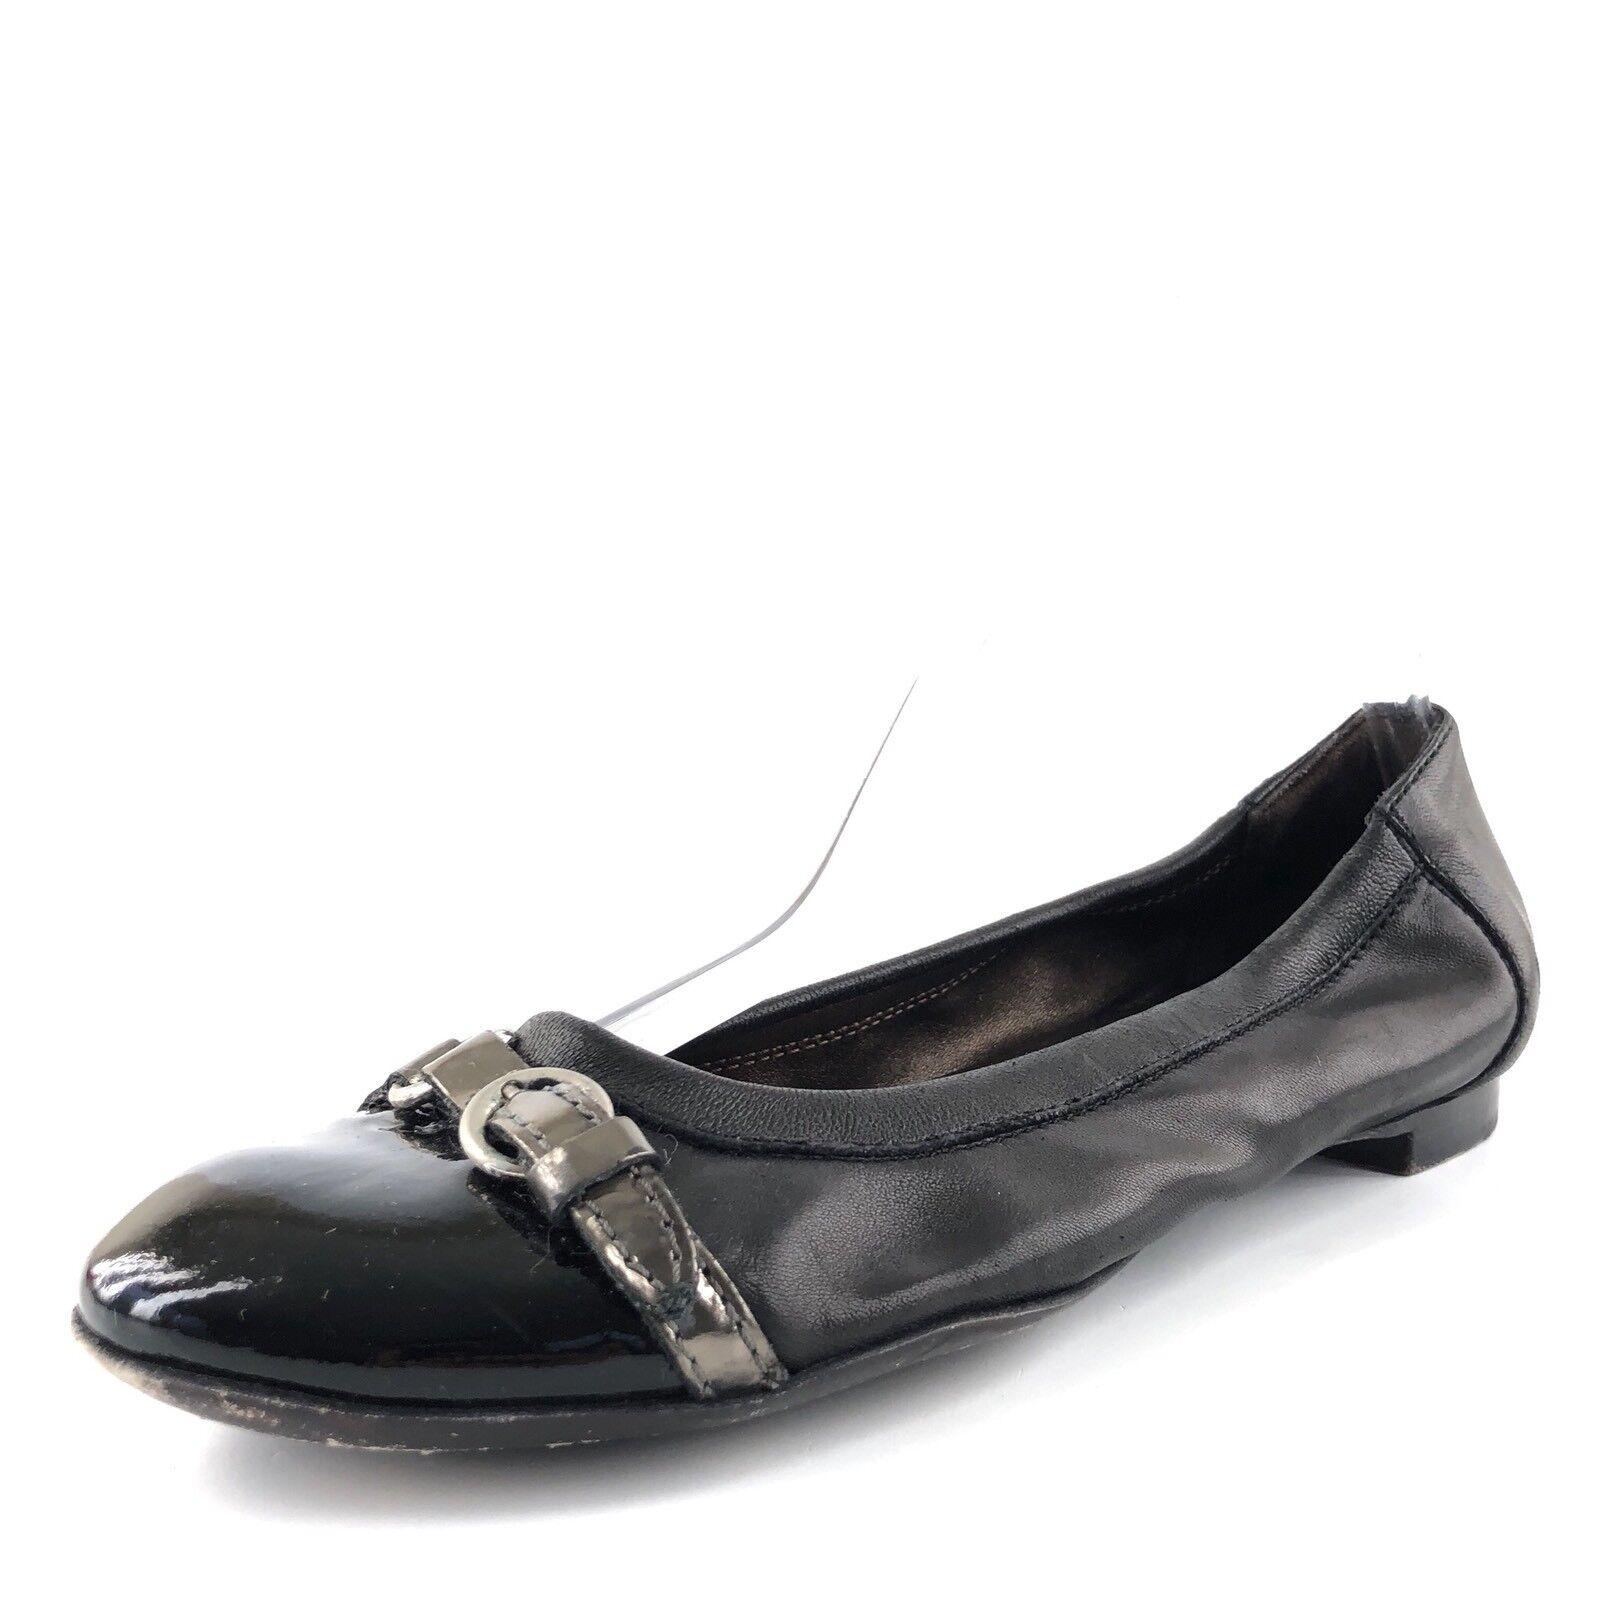 AGL Attilio Giusti Leombruni Womens Black Leather Toe Cap Ballet Flats Size 37.5